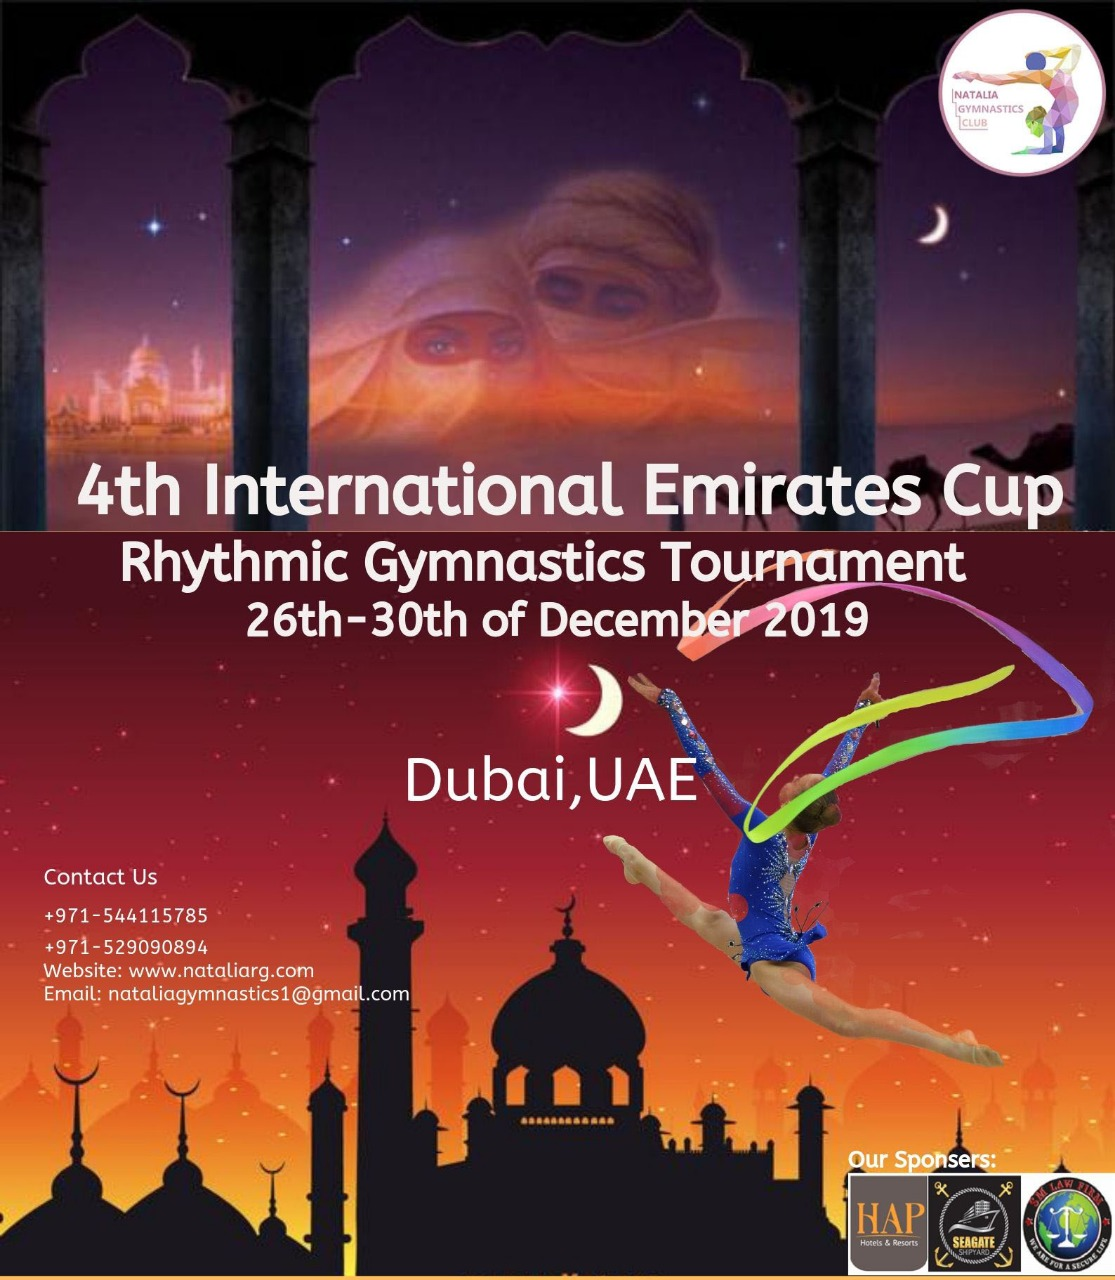 Calendario De International Champions Cup 2019.List Of The International Rhythmic Gymnastics Tournaments